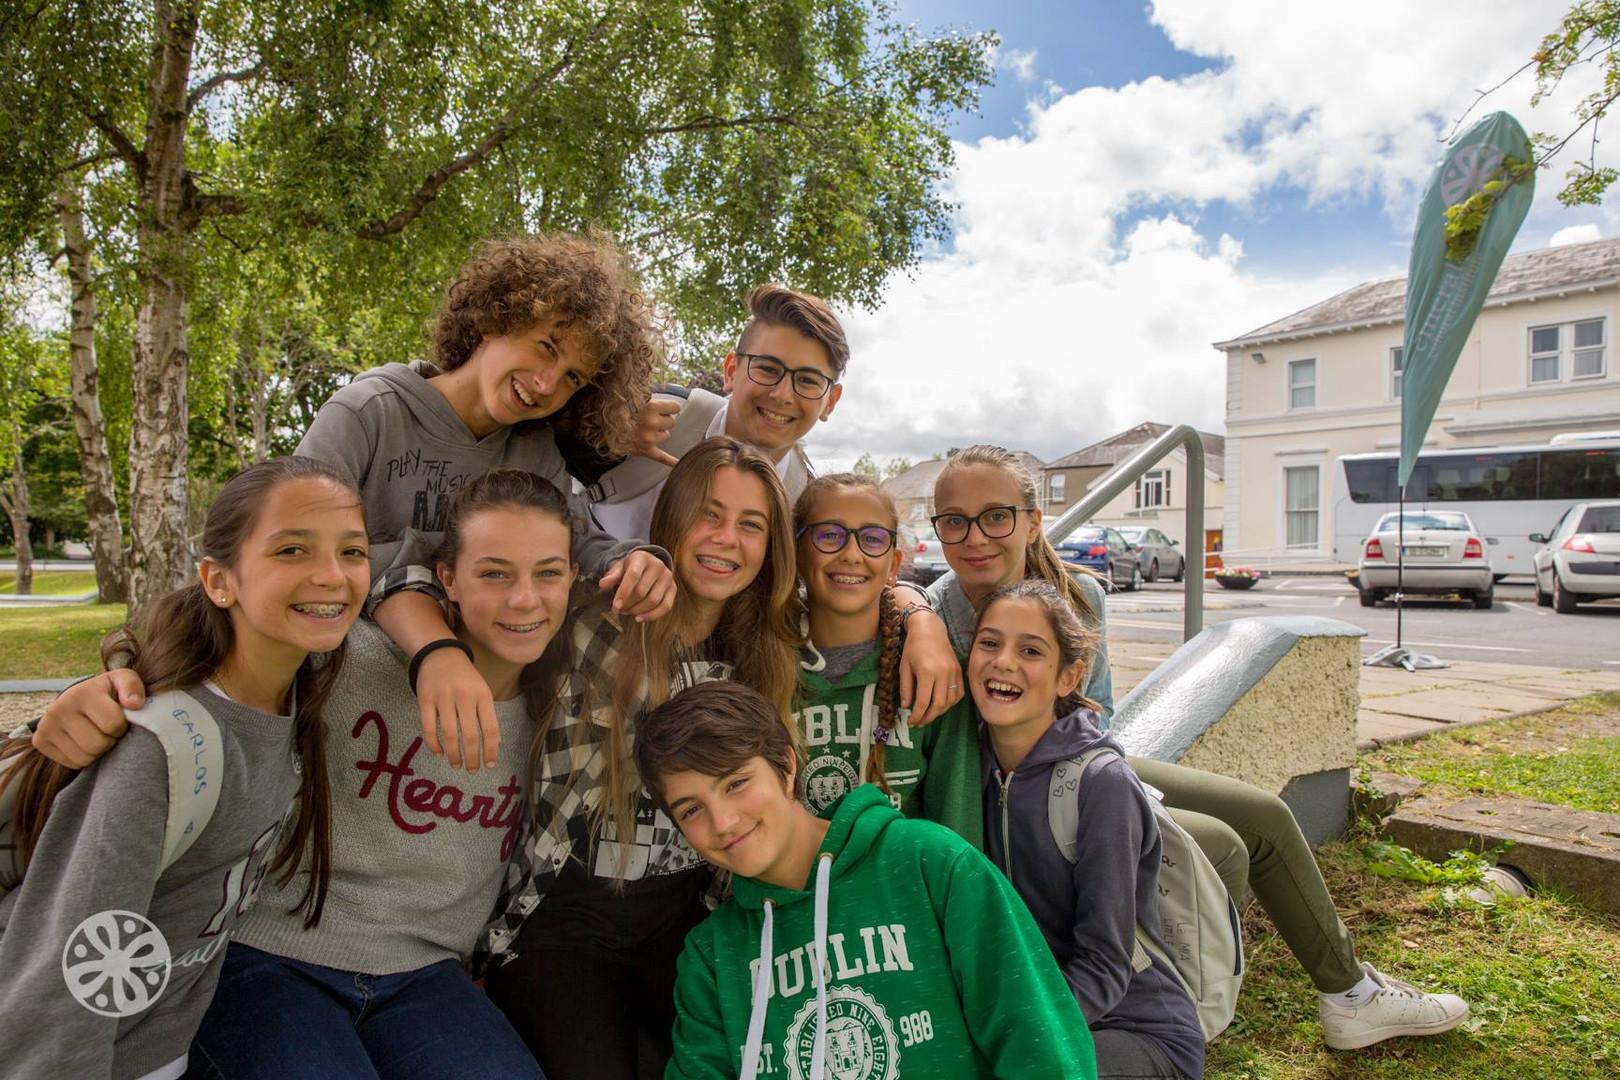 Emerald St. - Raphaela's School